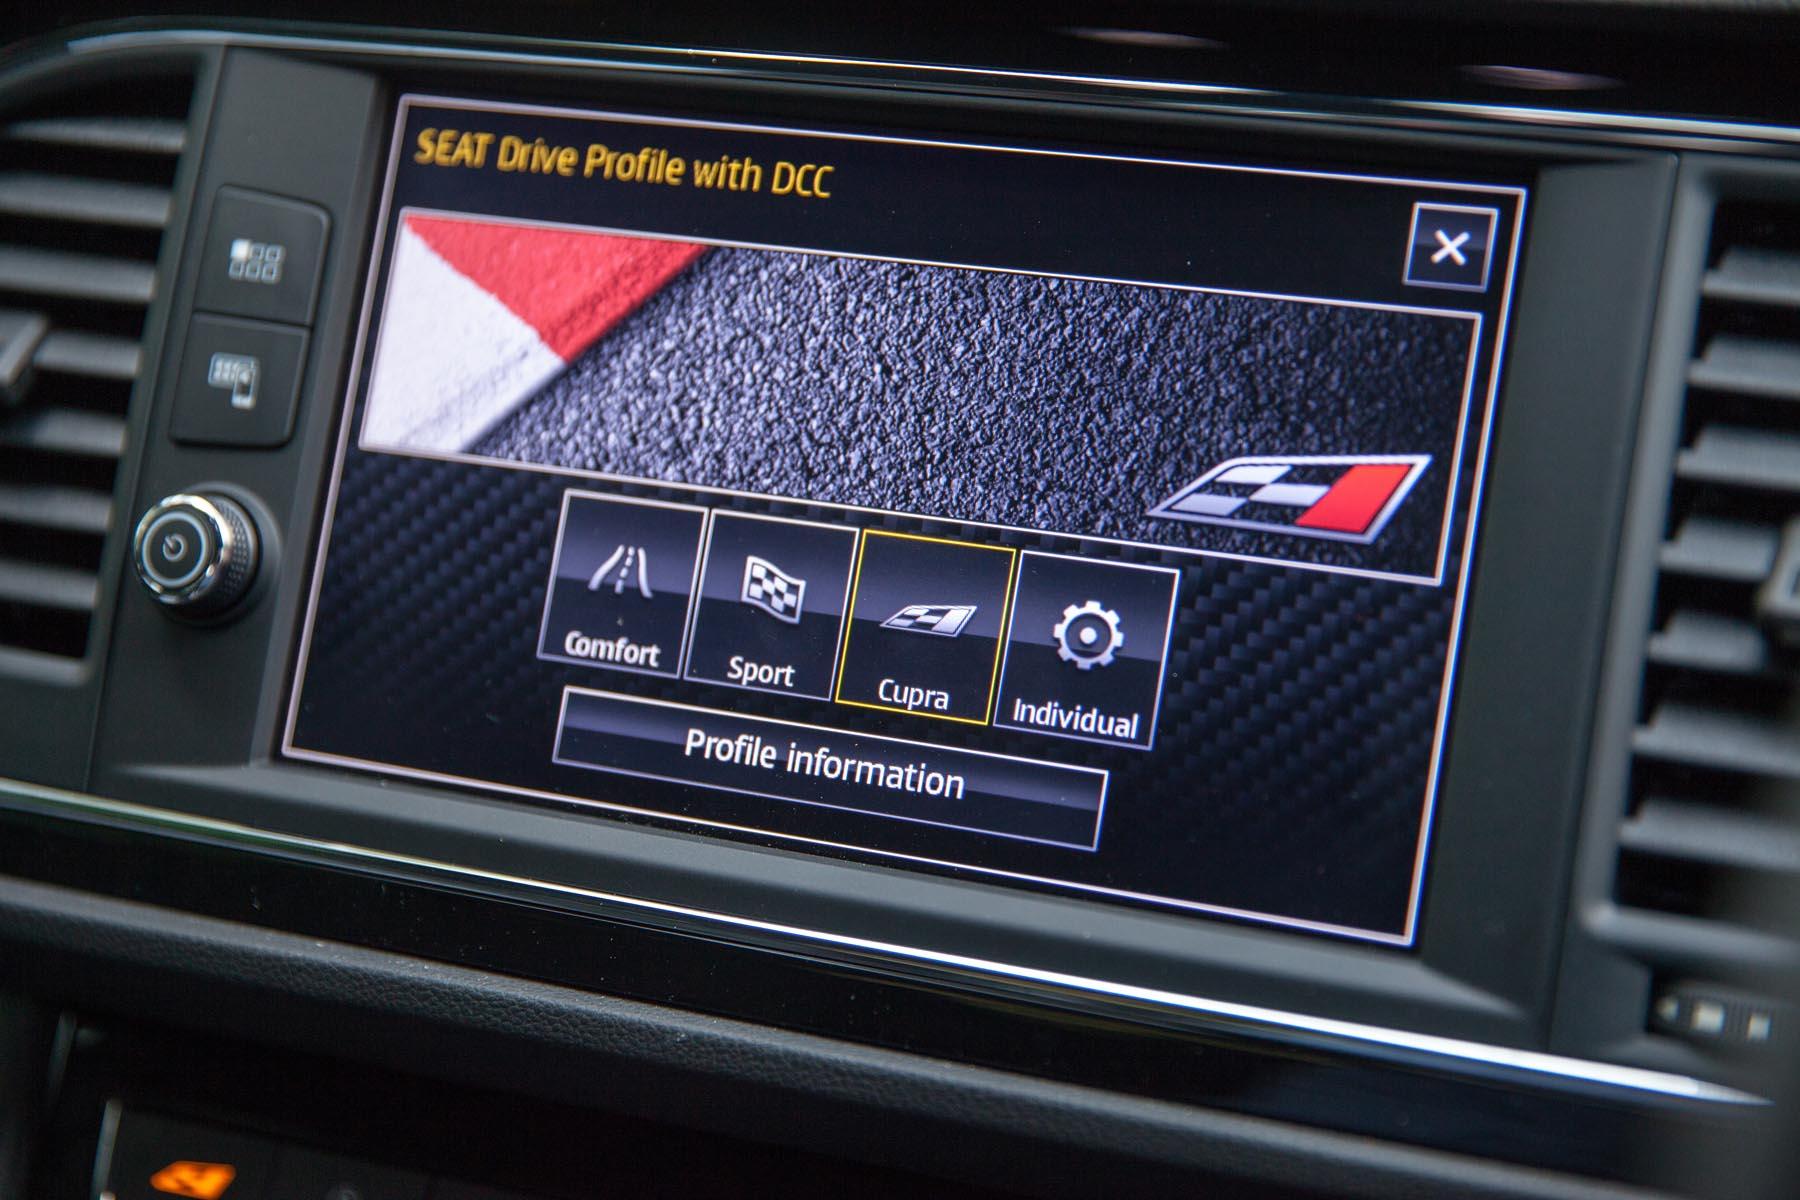 driven all new leon range used cars ni blog rh blog usedcarsni com 2016 Seat Leon 2016 Seat Leon